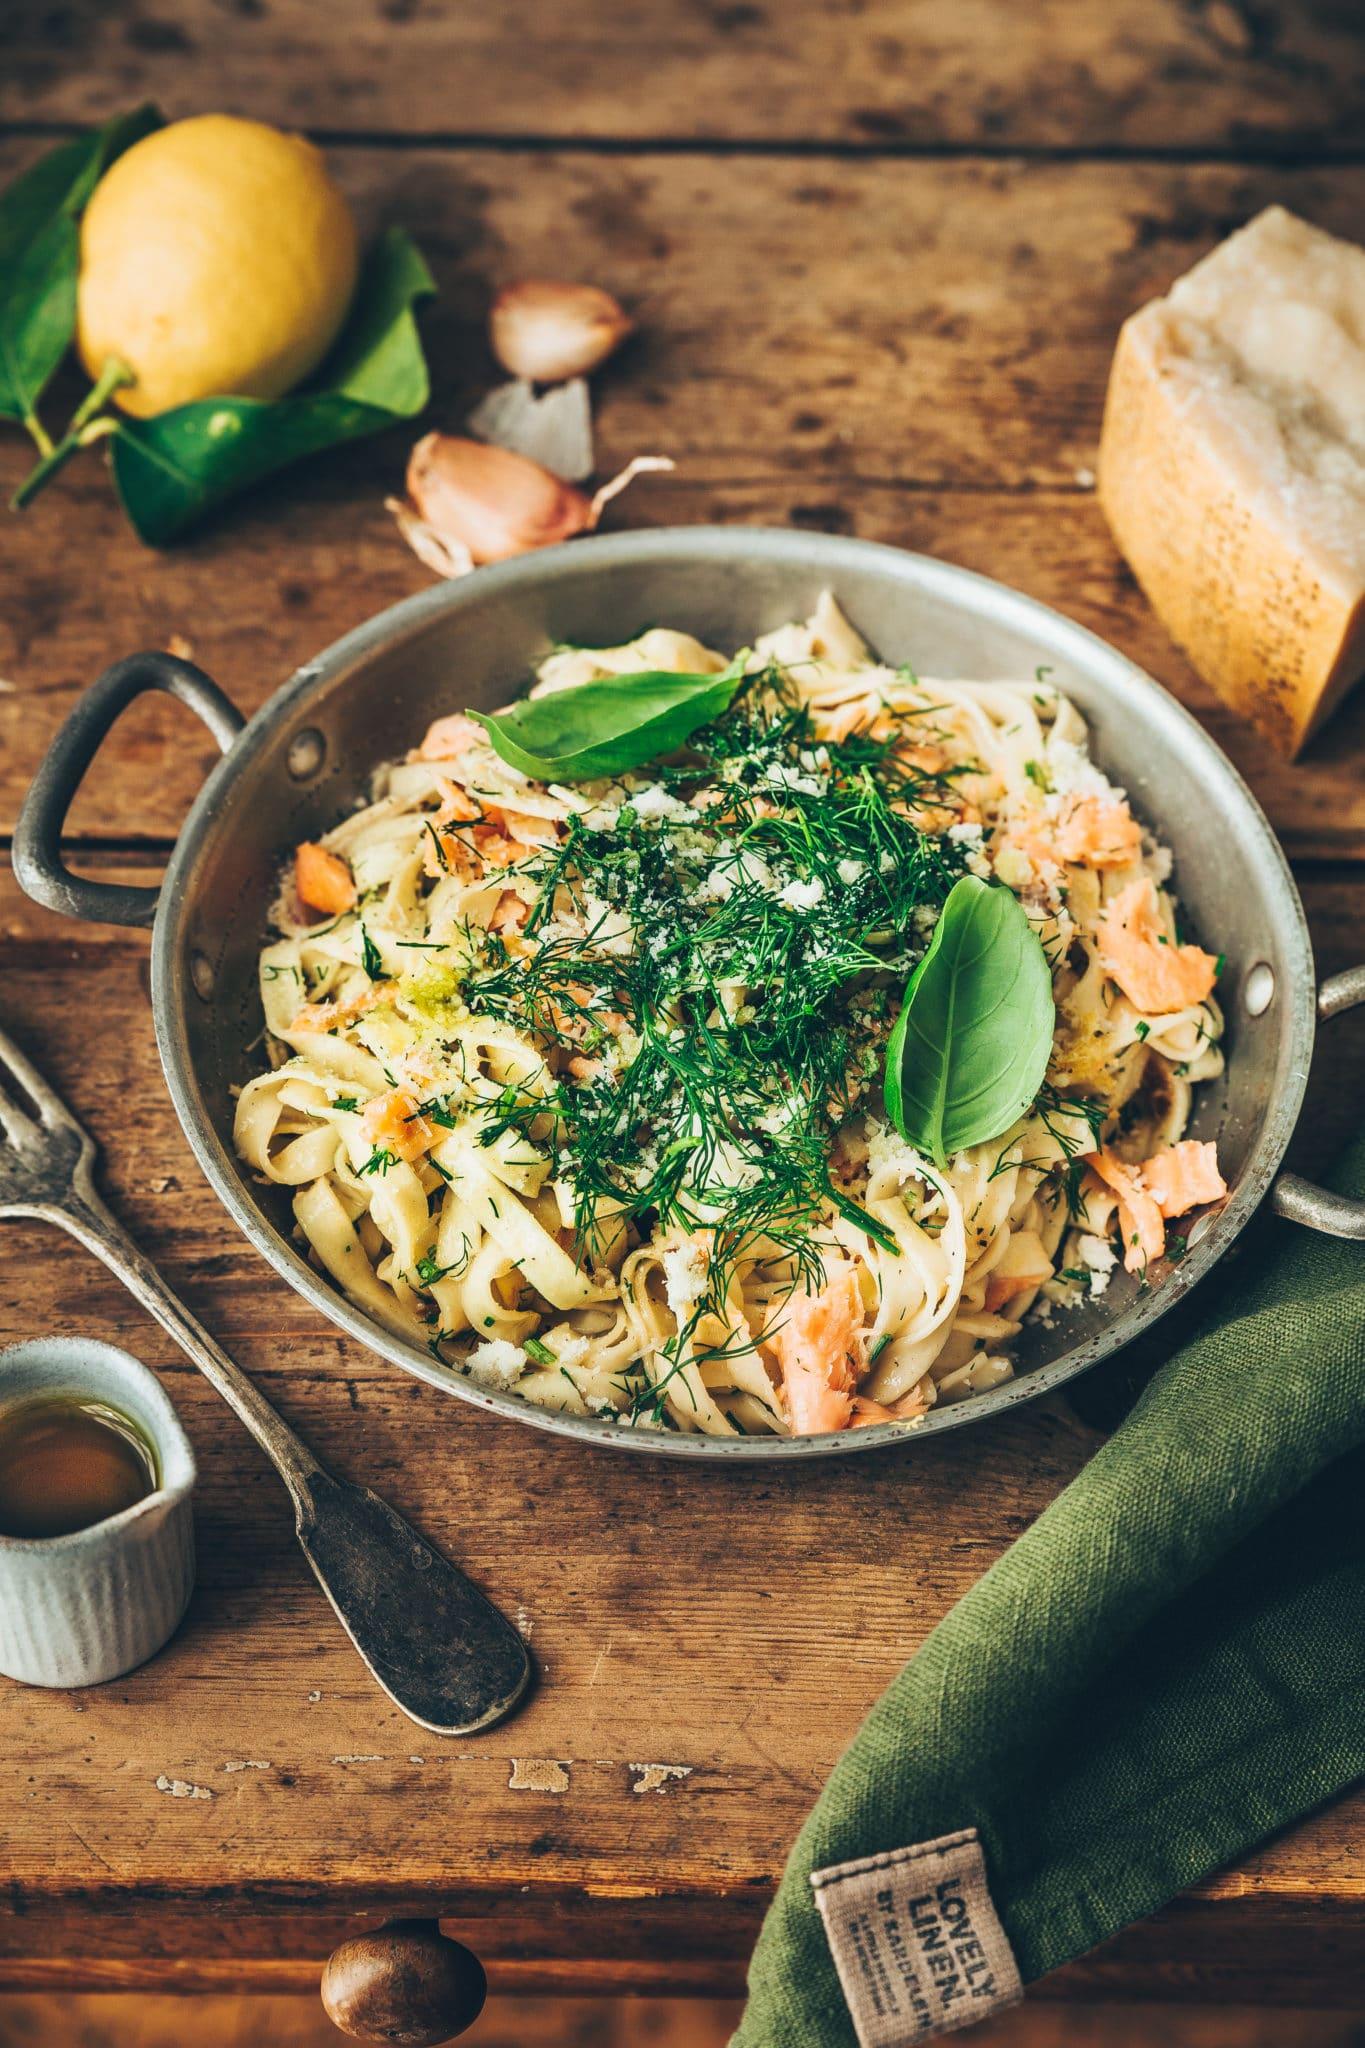 Pâtes au saumon Mégane Ardérighi - megandcook styliste culinaire